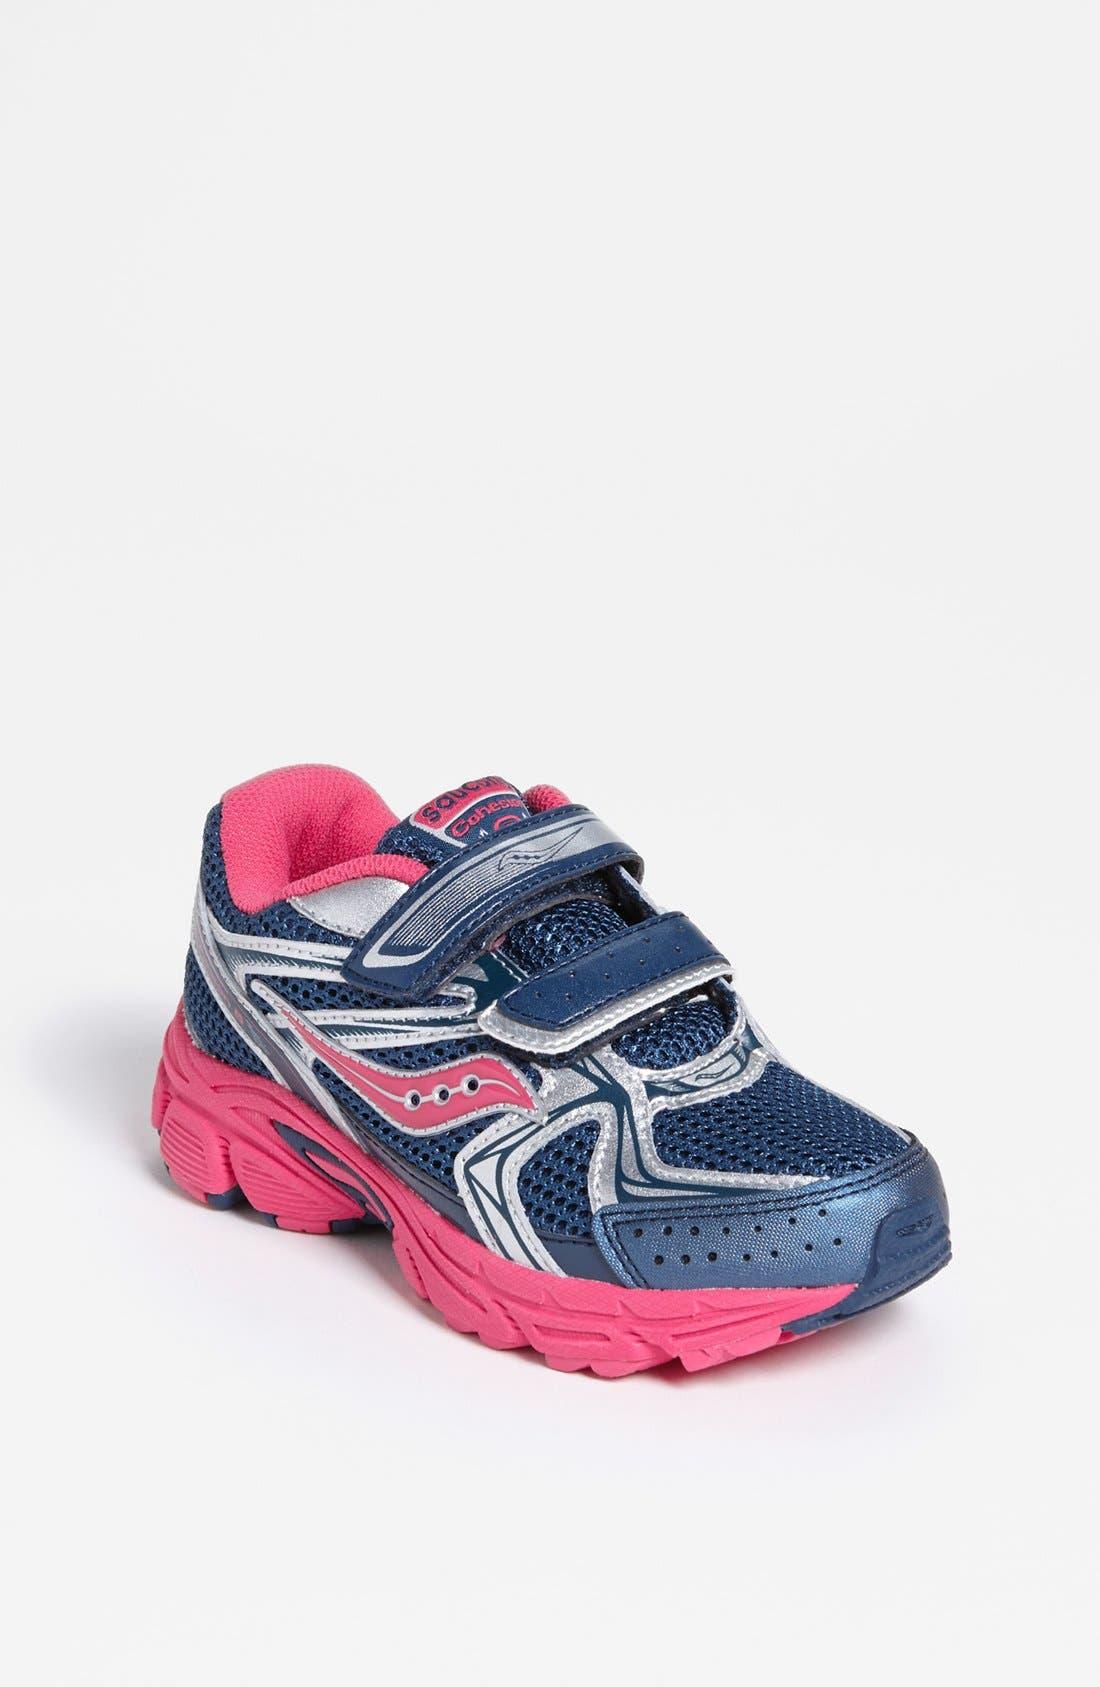 Alternate Image 1 Selected - Saucony 'Cohesion HL' Running Shoe (Toddler, Little Kid & Big Kid)